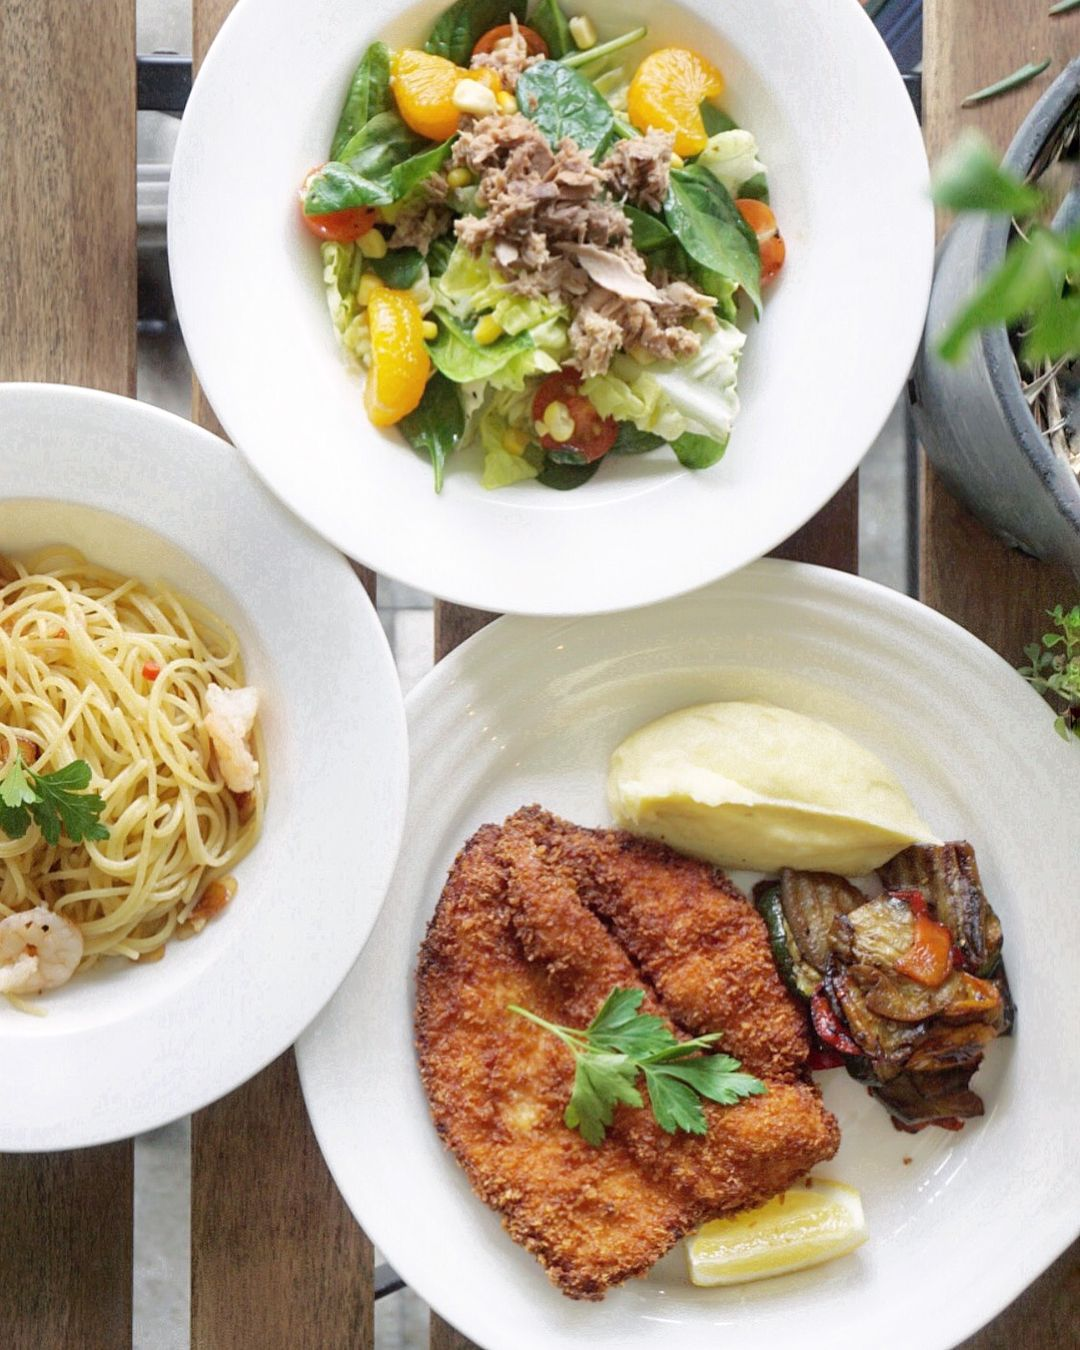 New Restaurants Mar 2018 - Casa MANINI No Brainer Lunch Set